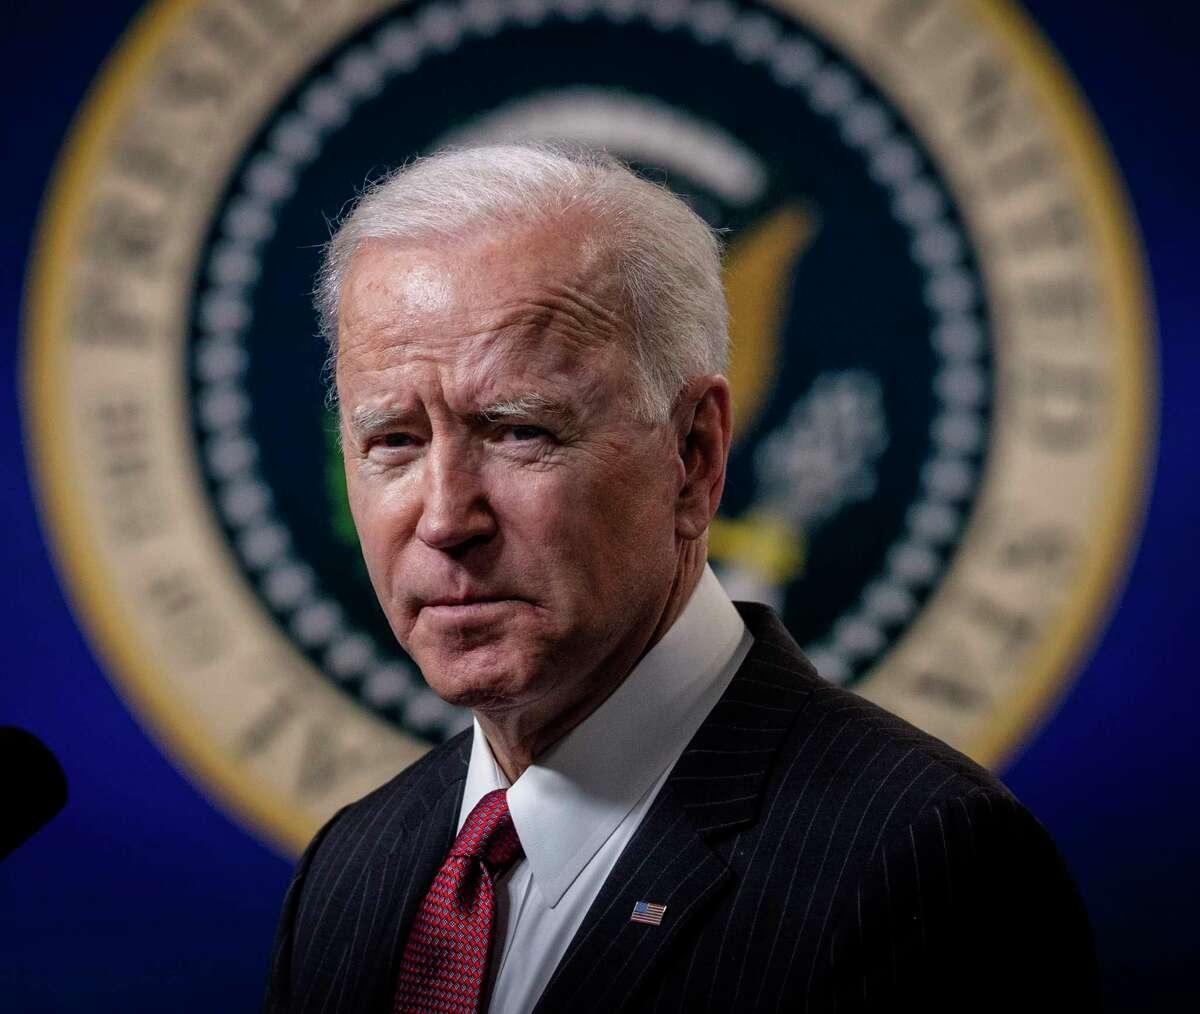 President Joe Biden is shown at the White House in Washington on Feb. 10, 2021.